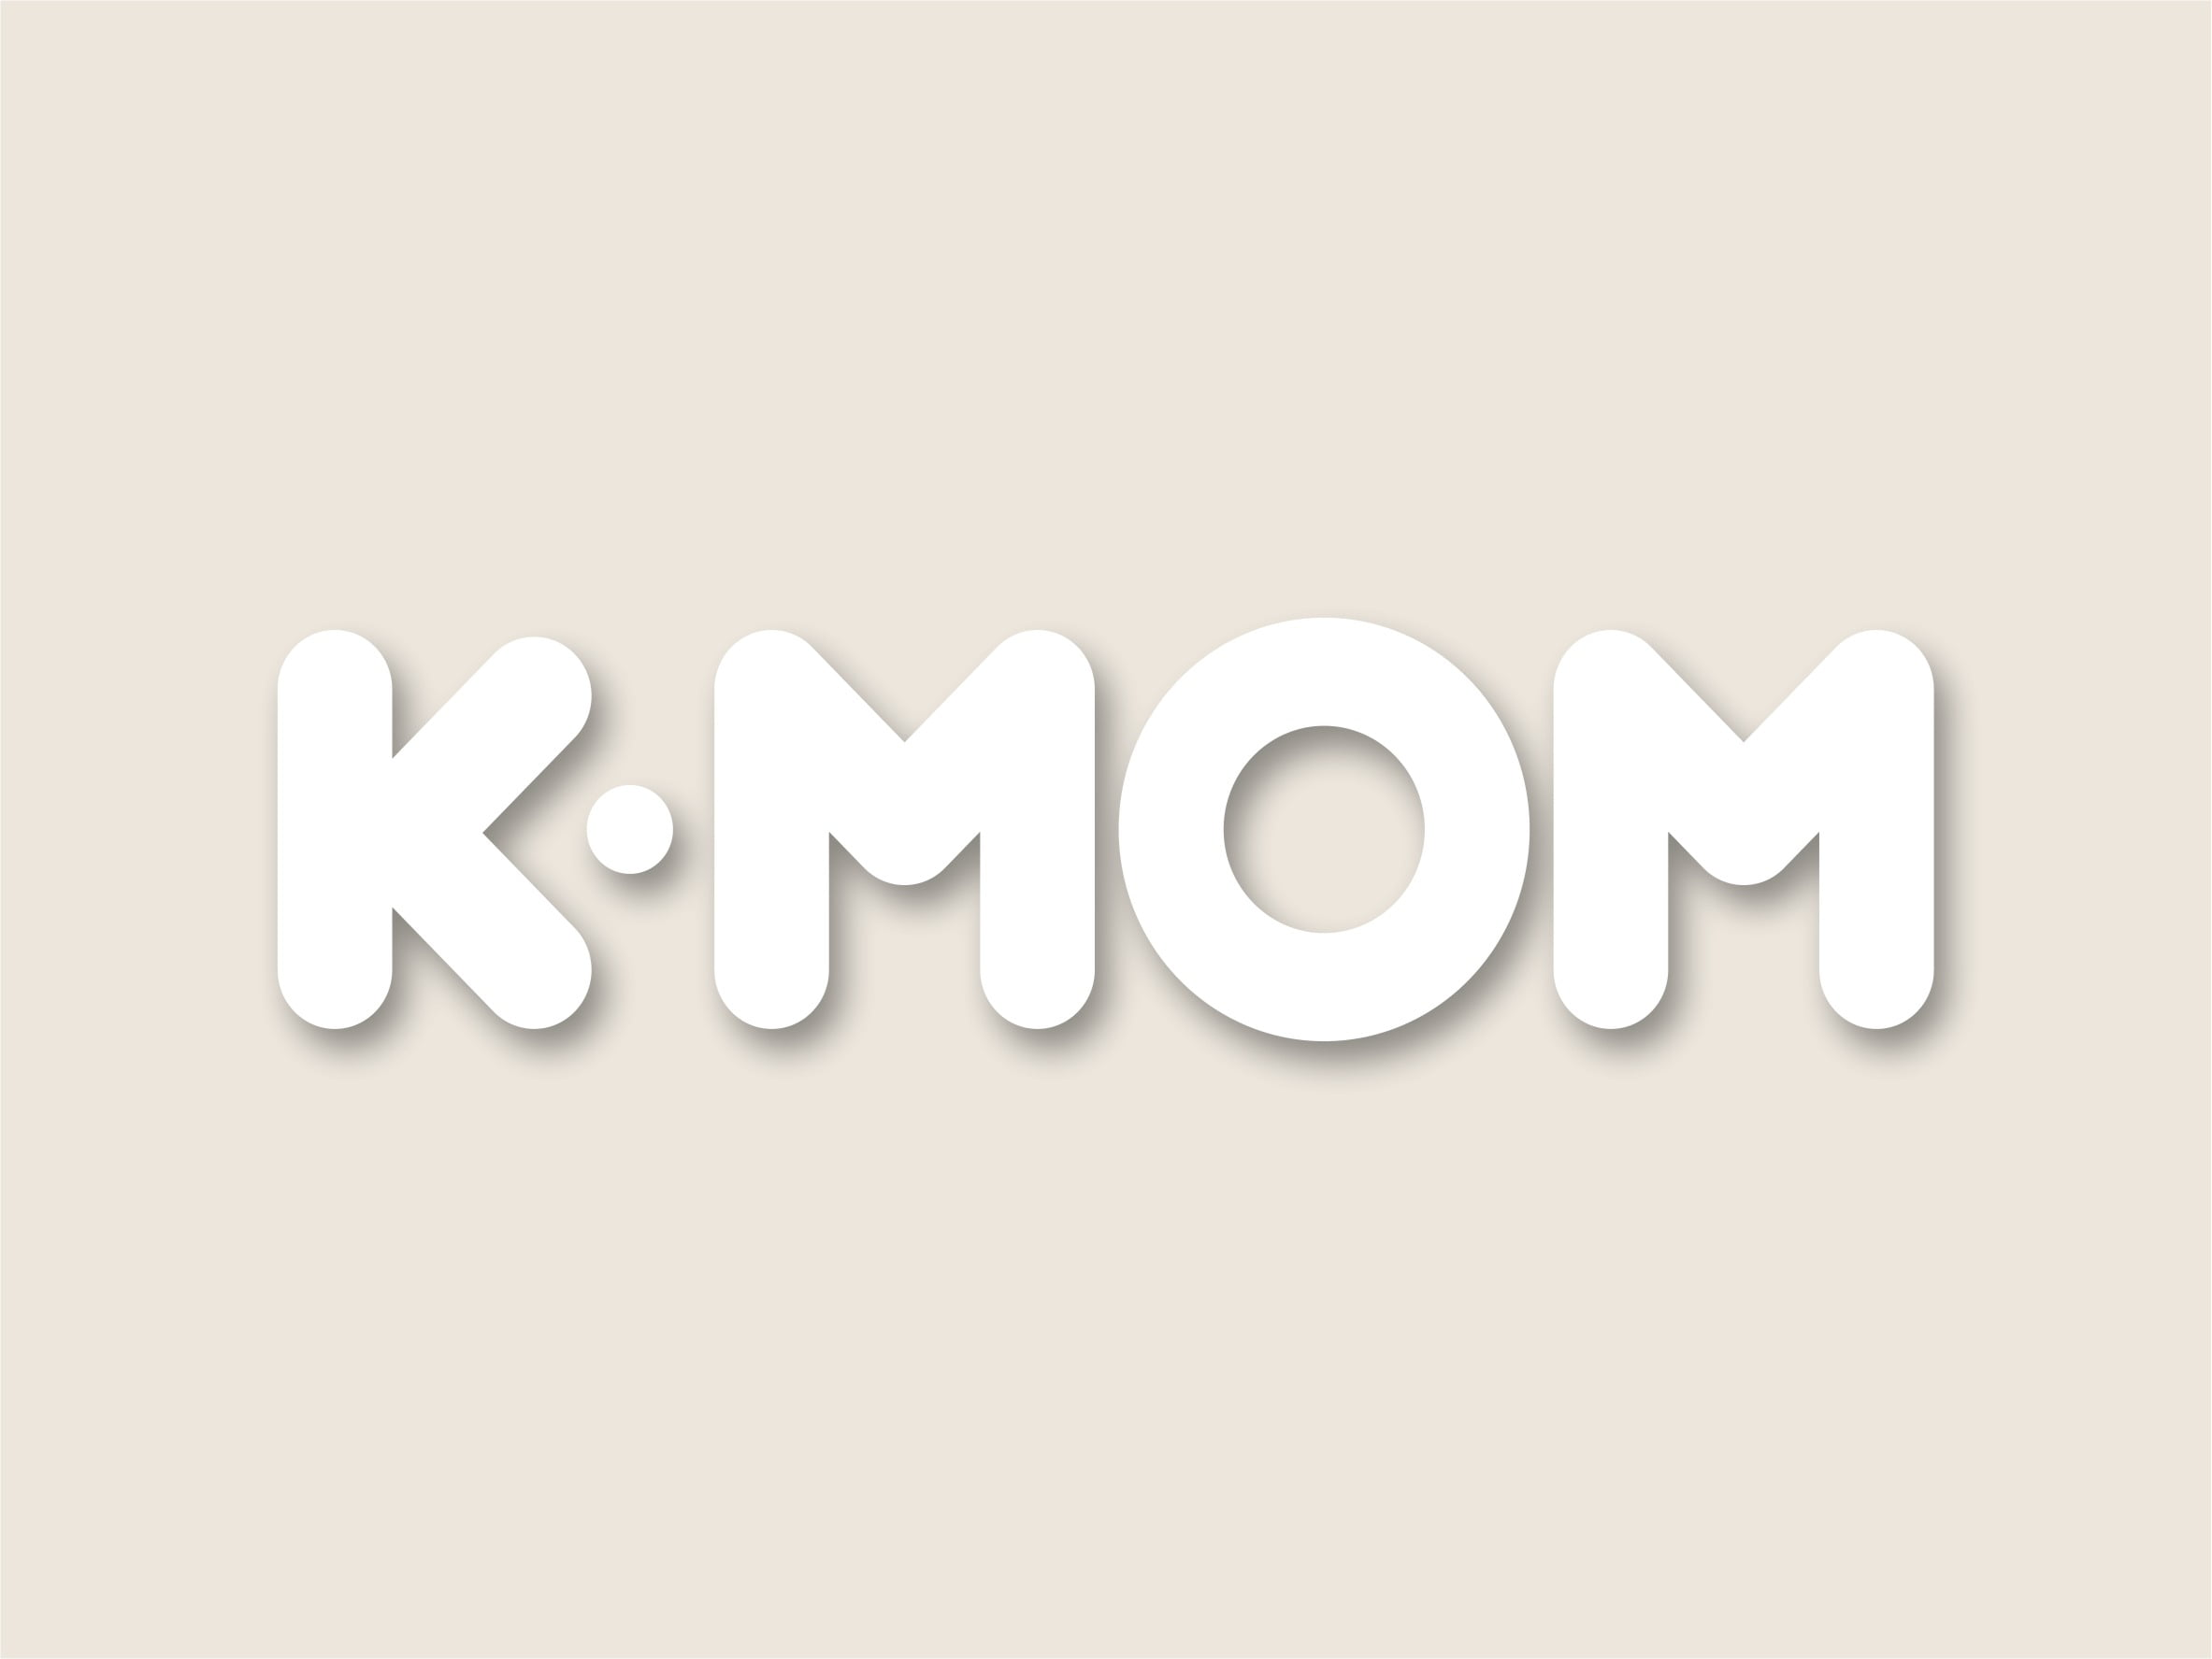 MB K_MOM baltas+rusvas